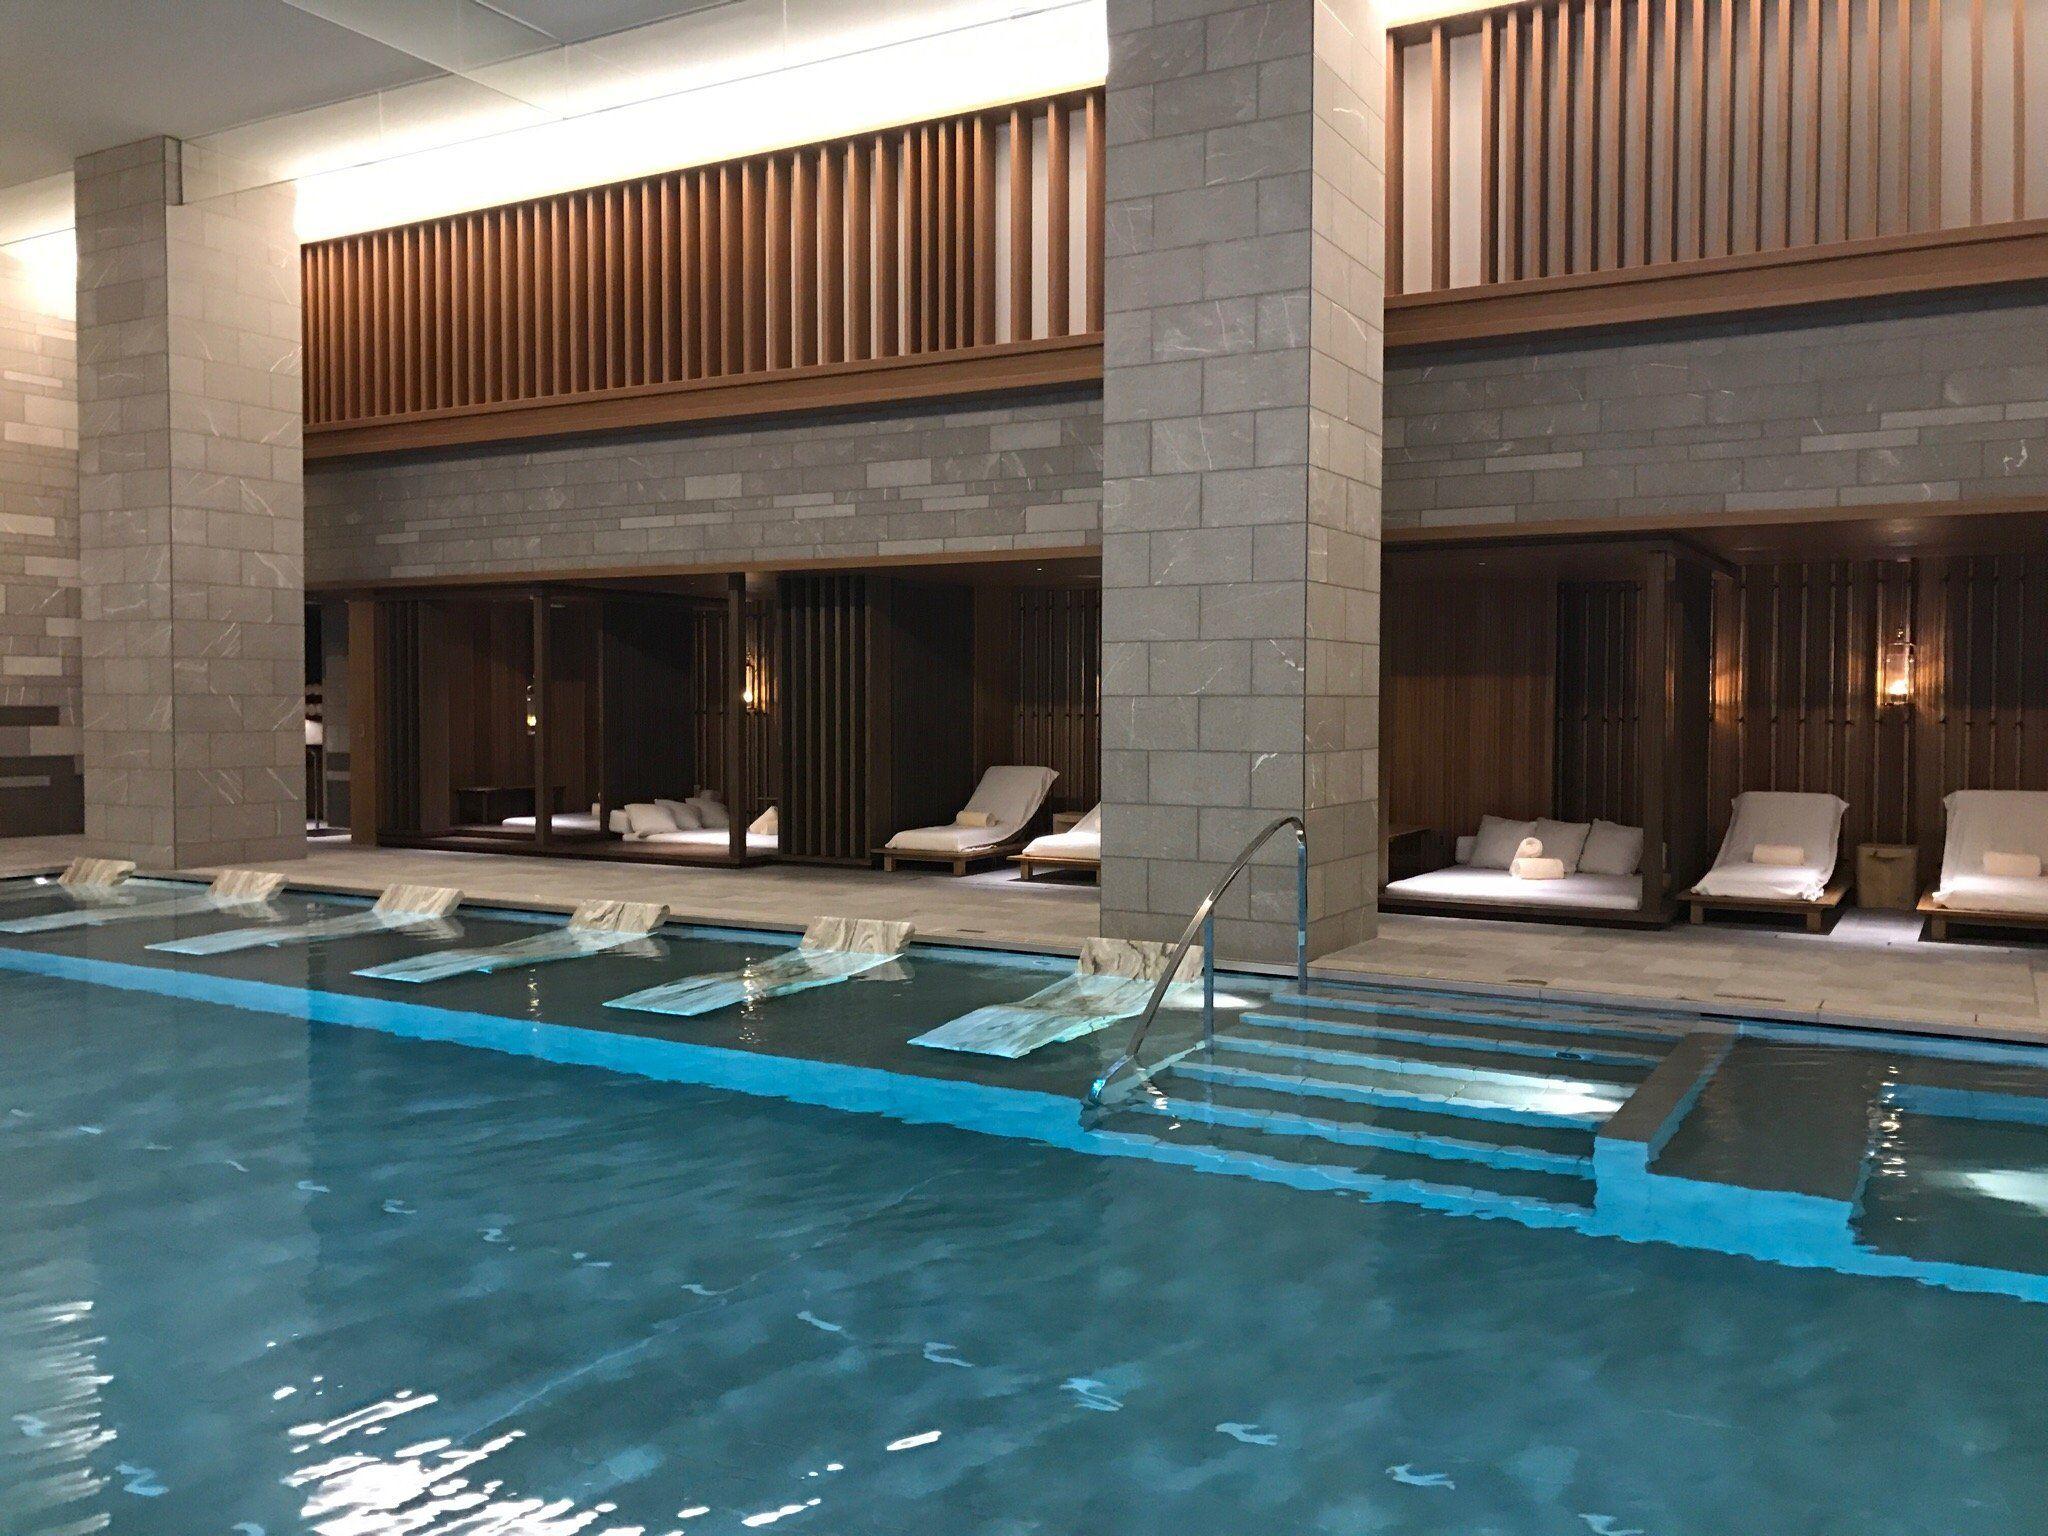 Four Seasons Hotel Kyoto Updated 2018 Reviews Price Comparison And 433 Photos Japan Tripadvisor Pool Bar Design Four Seasons Hotel Seasons Hotel